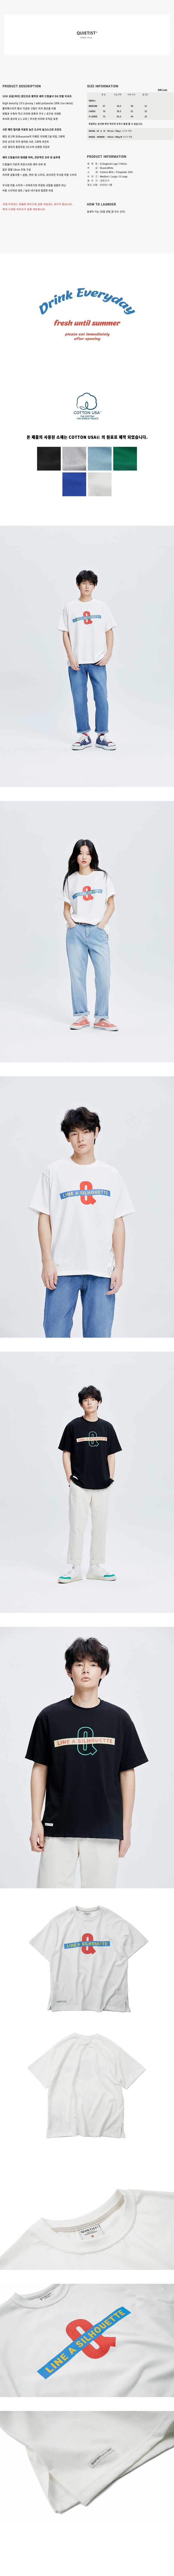 Q 다이애그널 로고 티셔츠 (white)